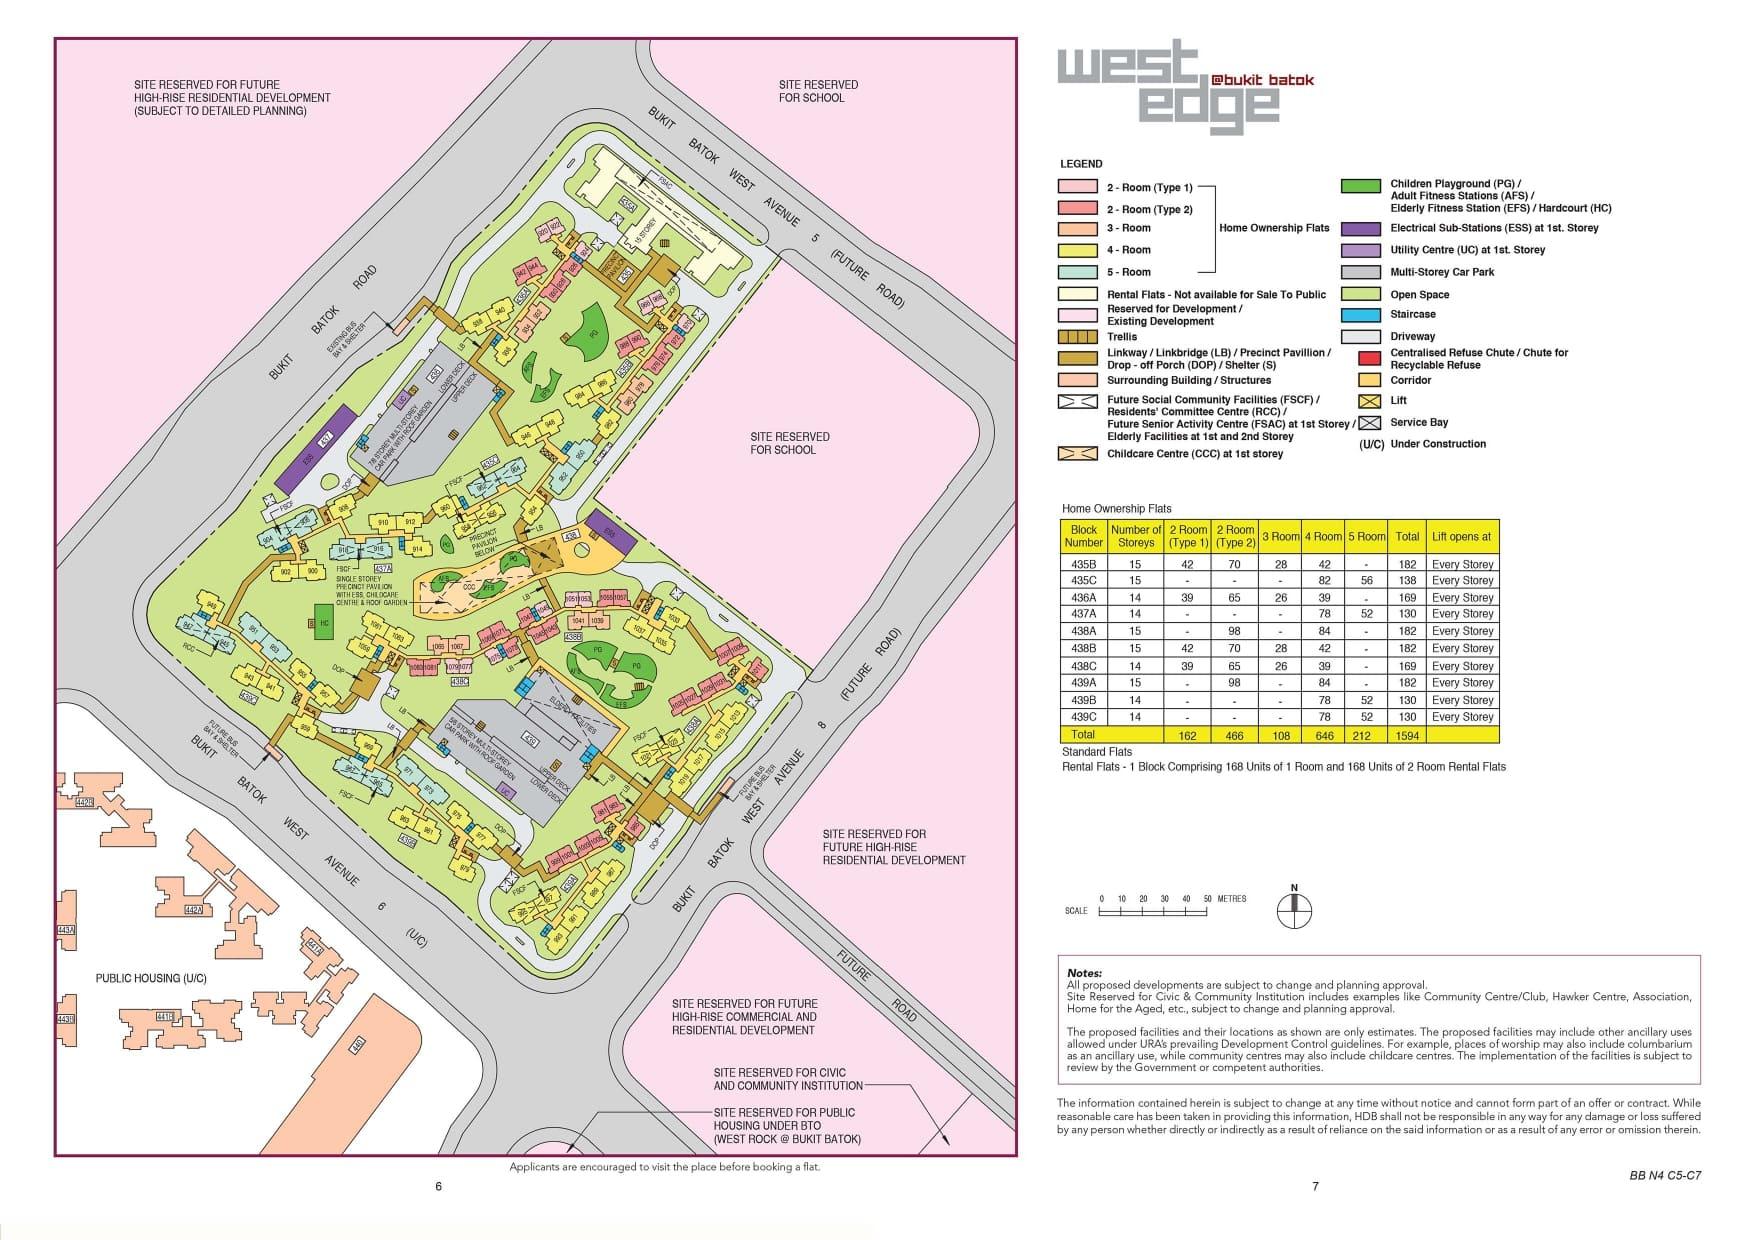 West Edge @ Bukit Batok Site Plan